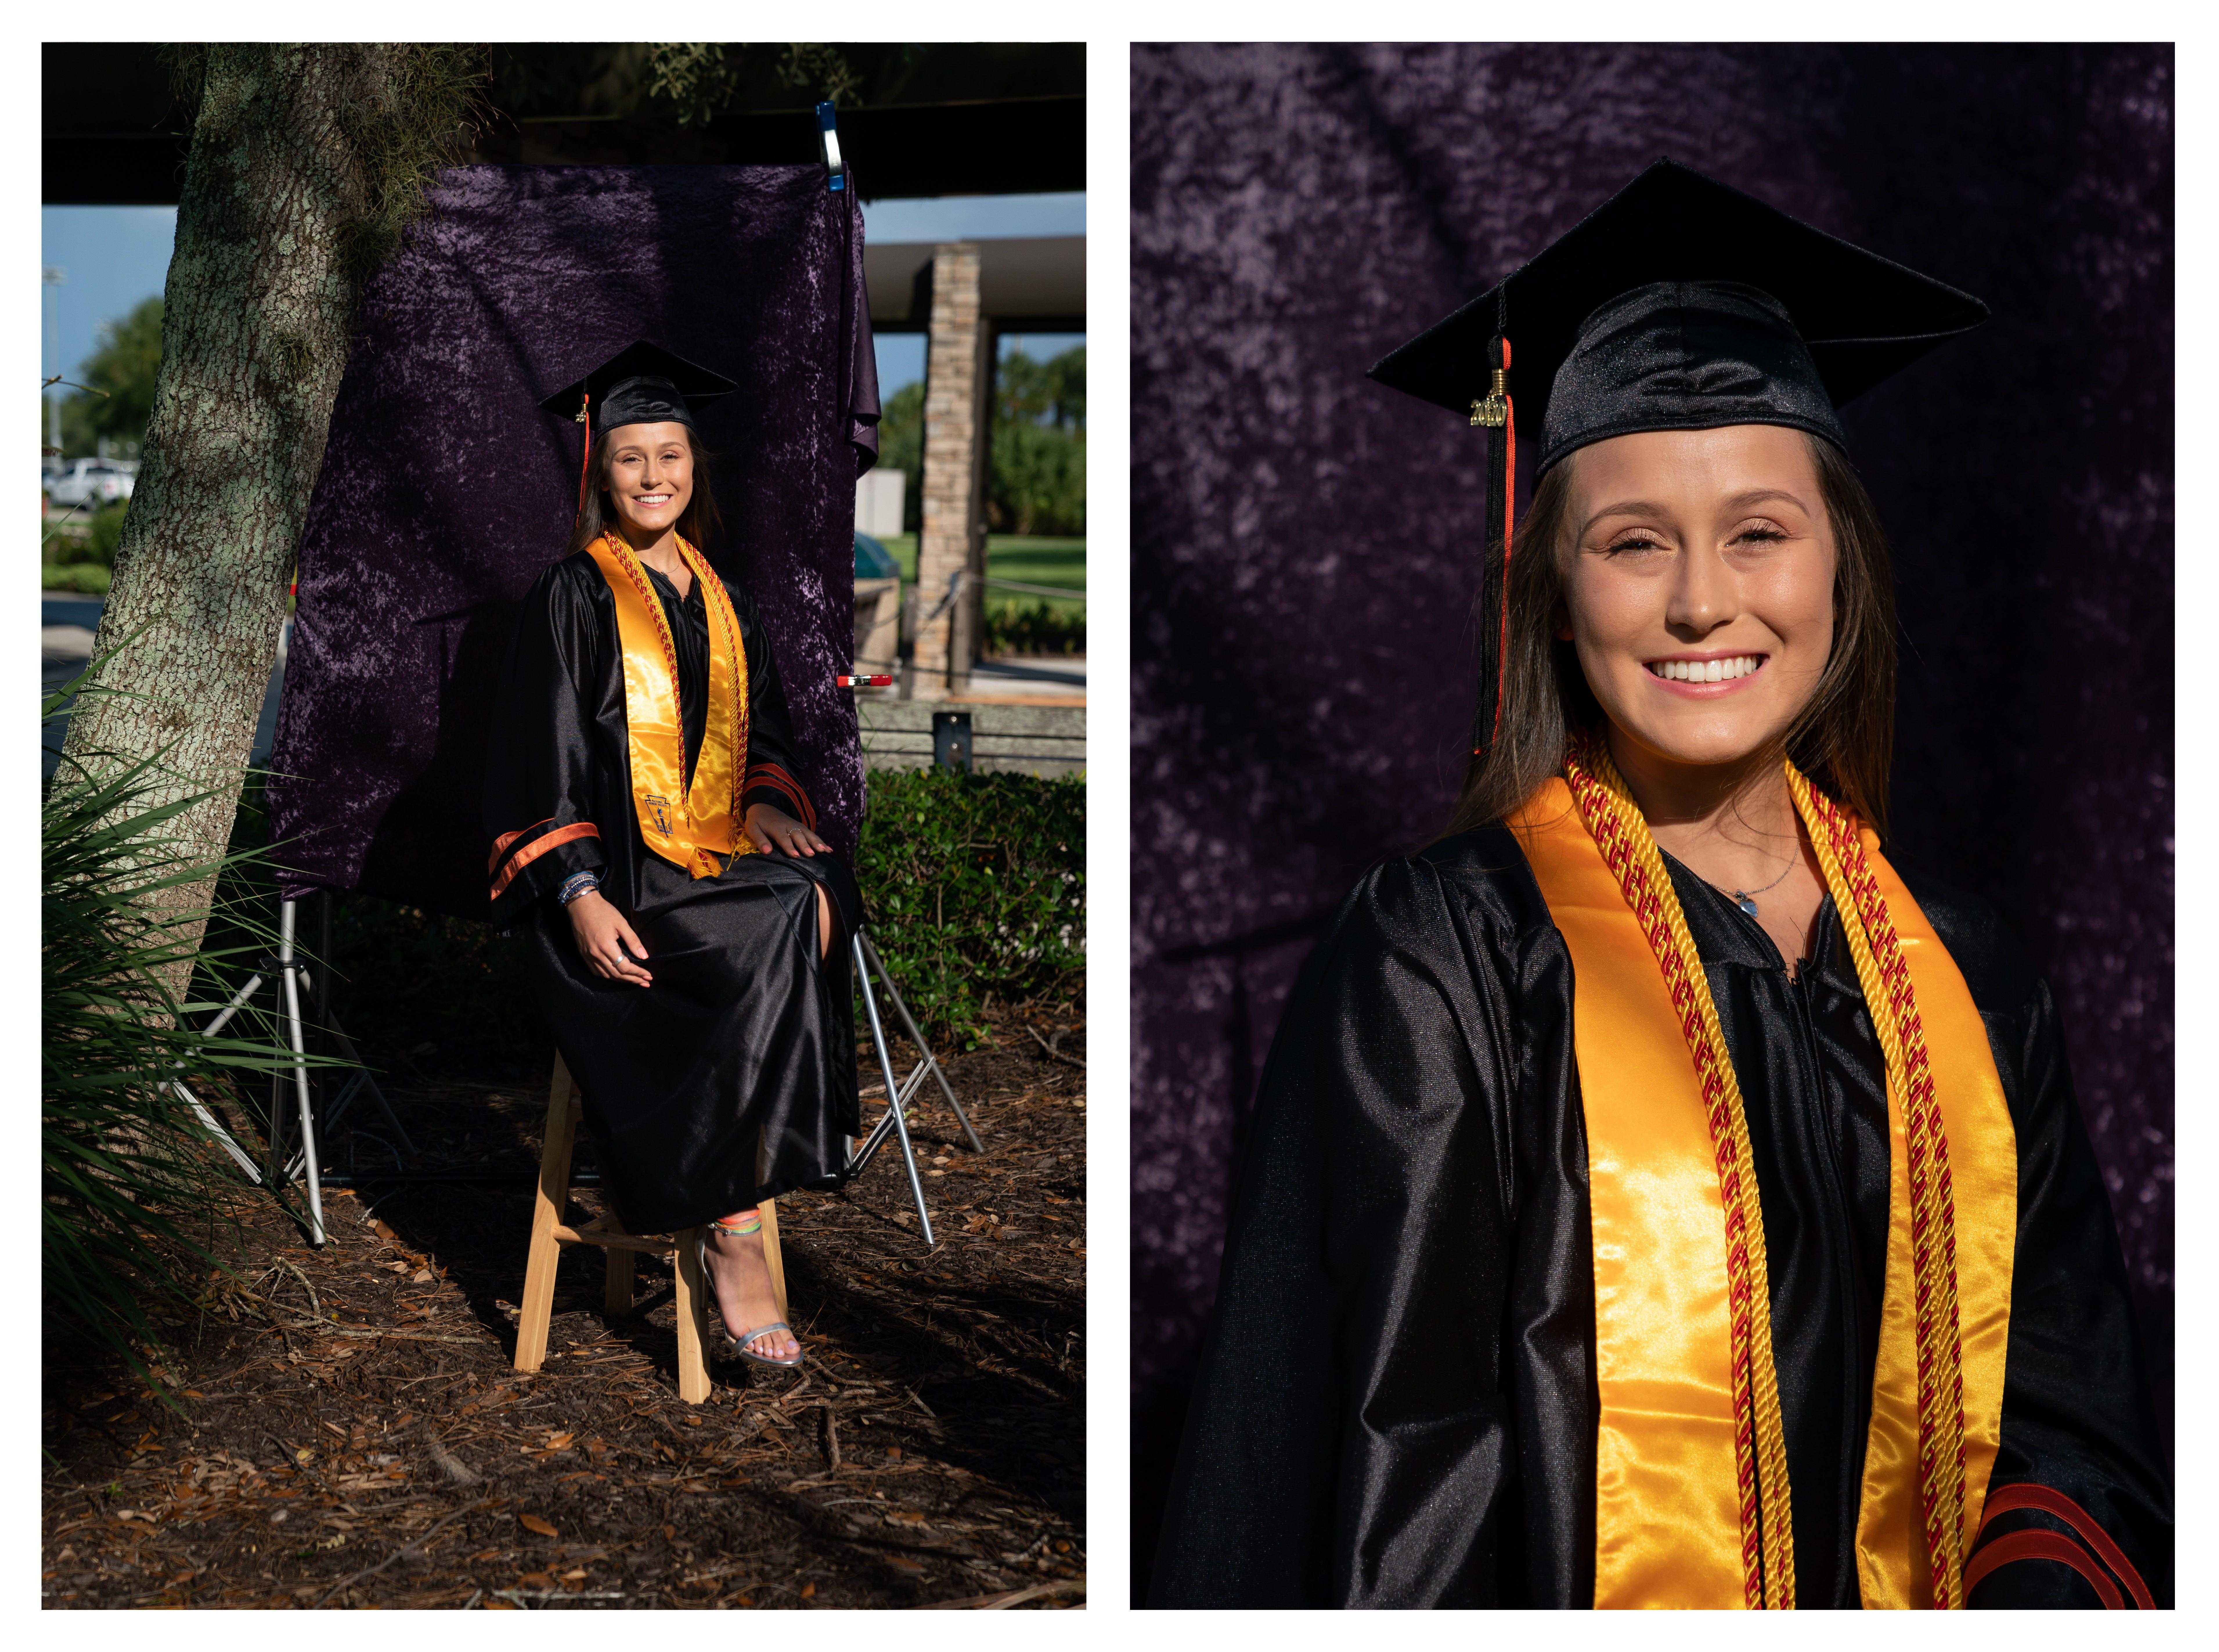 Victoria Novotny, 2020 graduate of Lely High School.